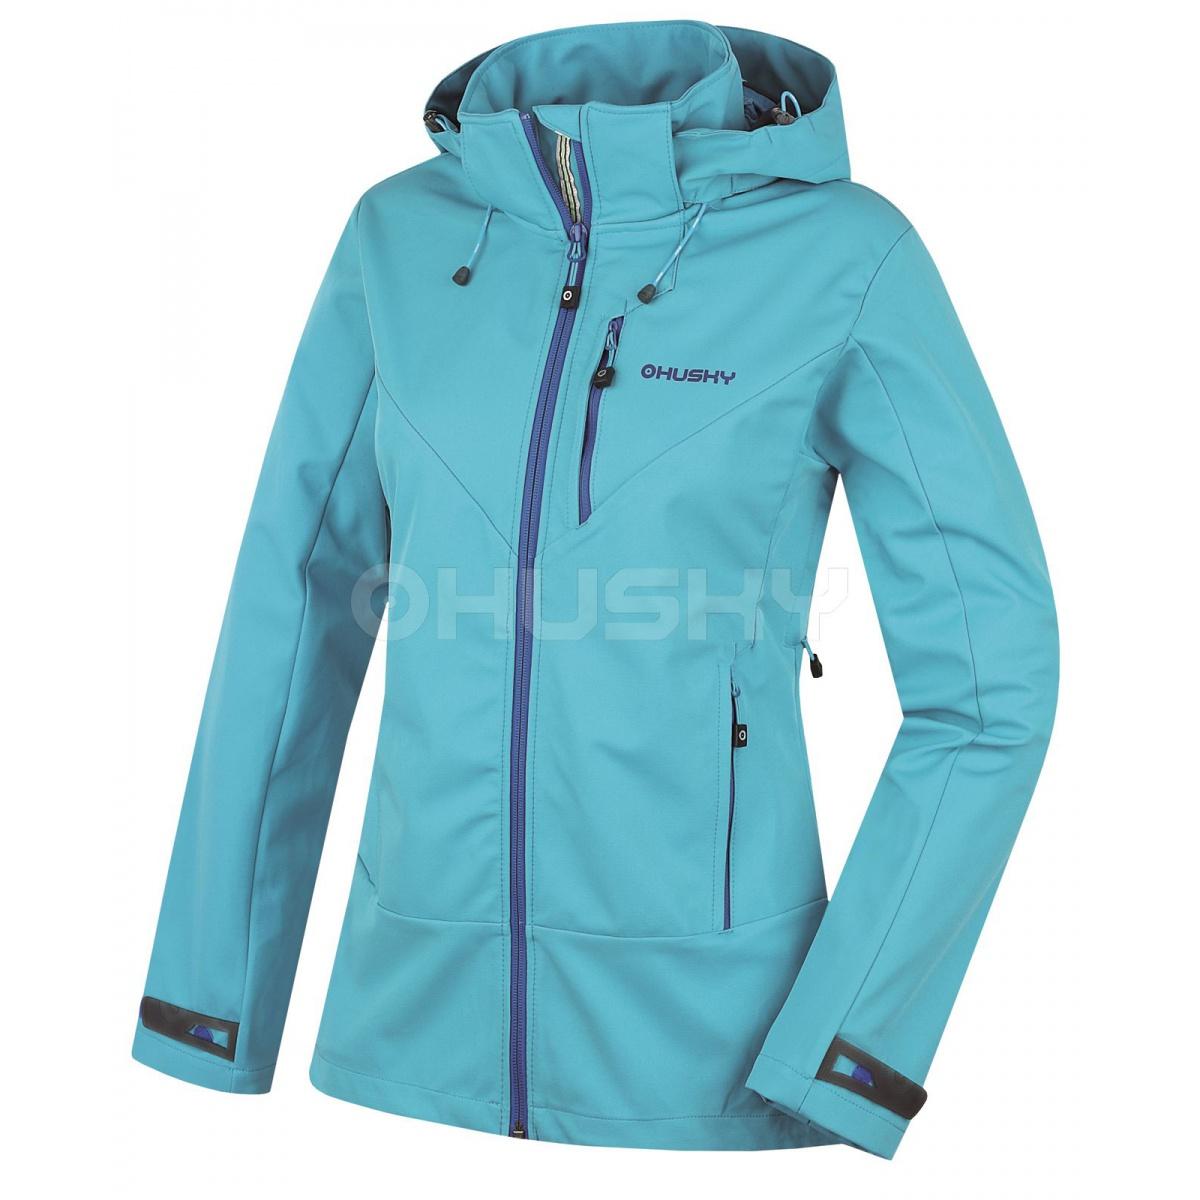 Dámská outdoor bunda - Spoly L – modrá  379b88aebd6